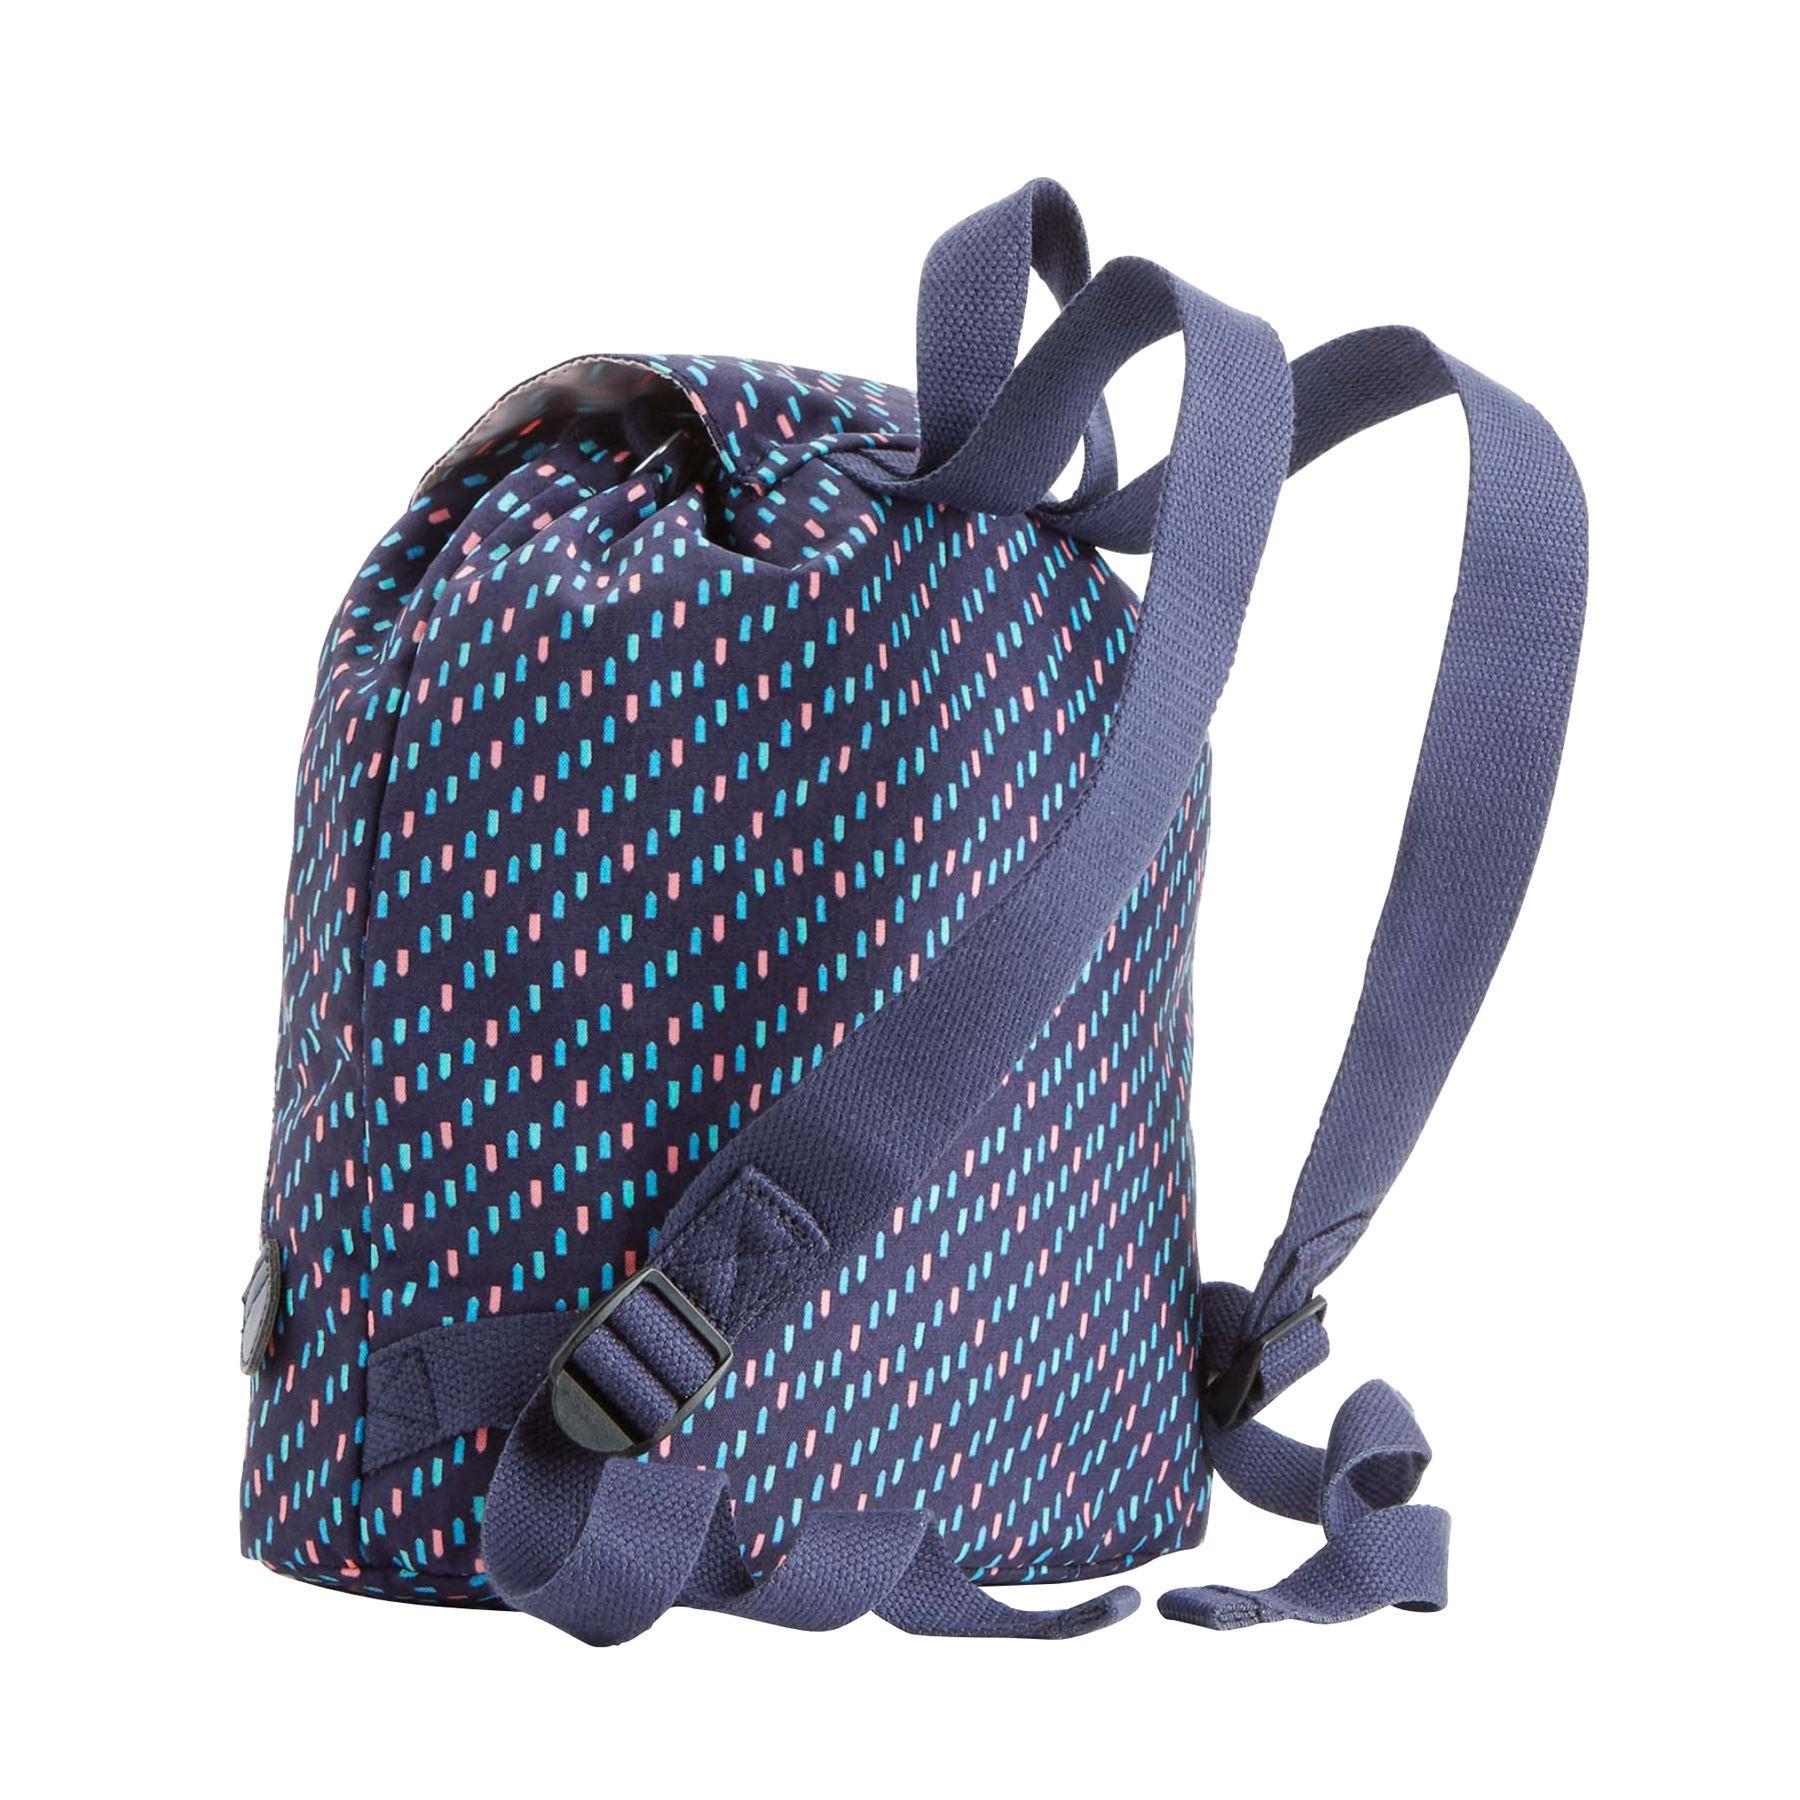 80c8f373ba7 Kipling Bustling Backpack Rucksack Work College University New 2018 ...